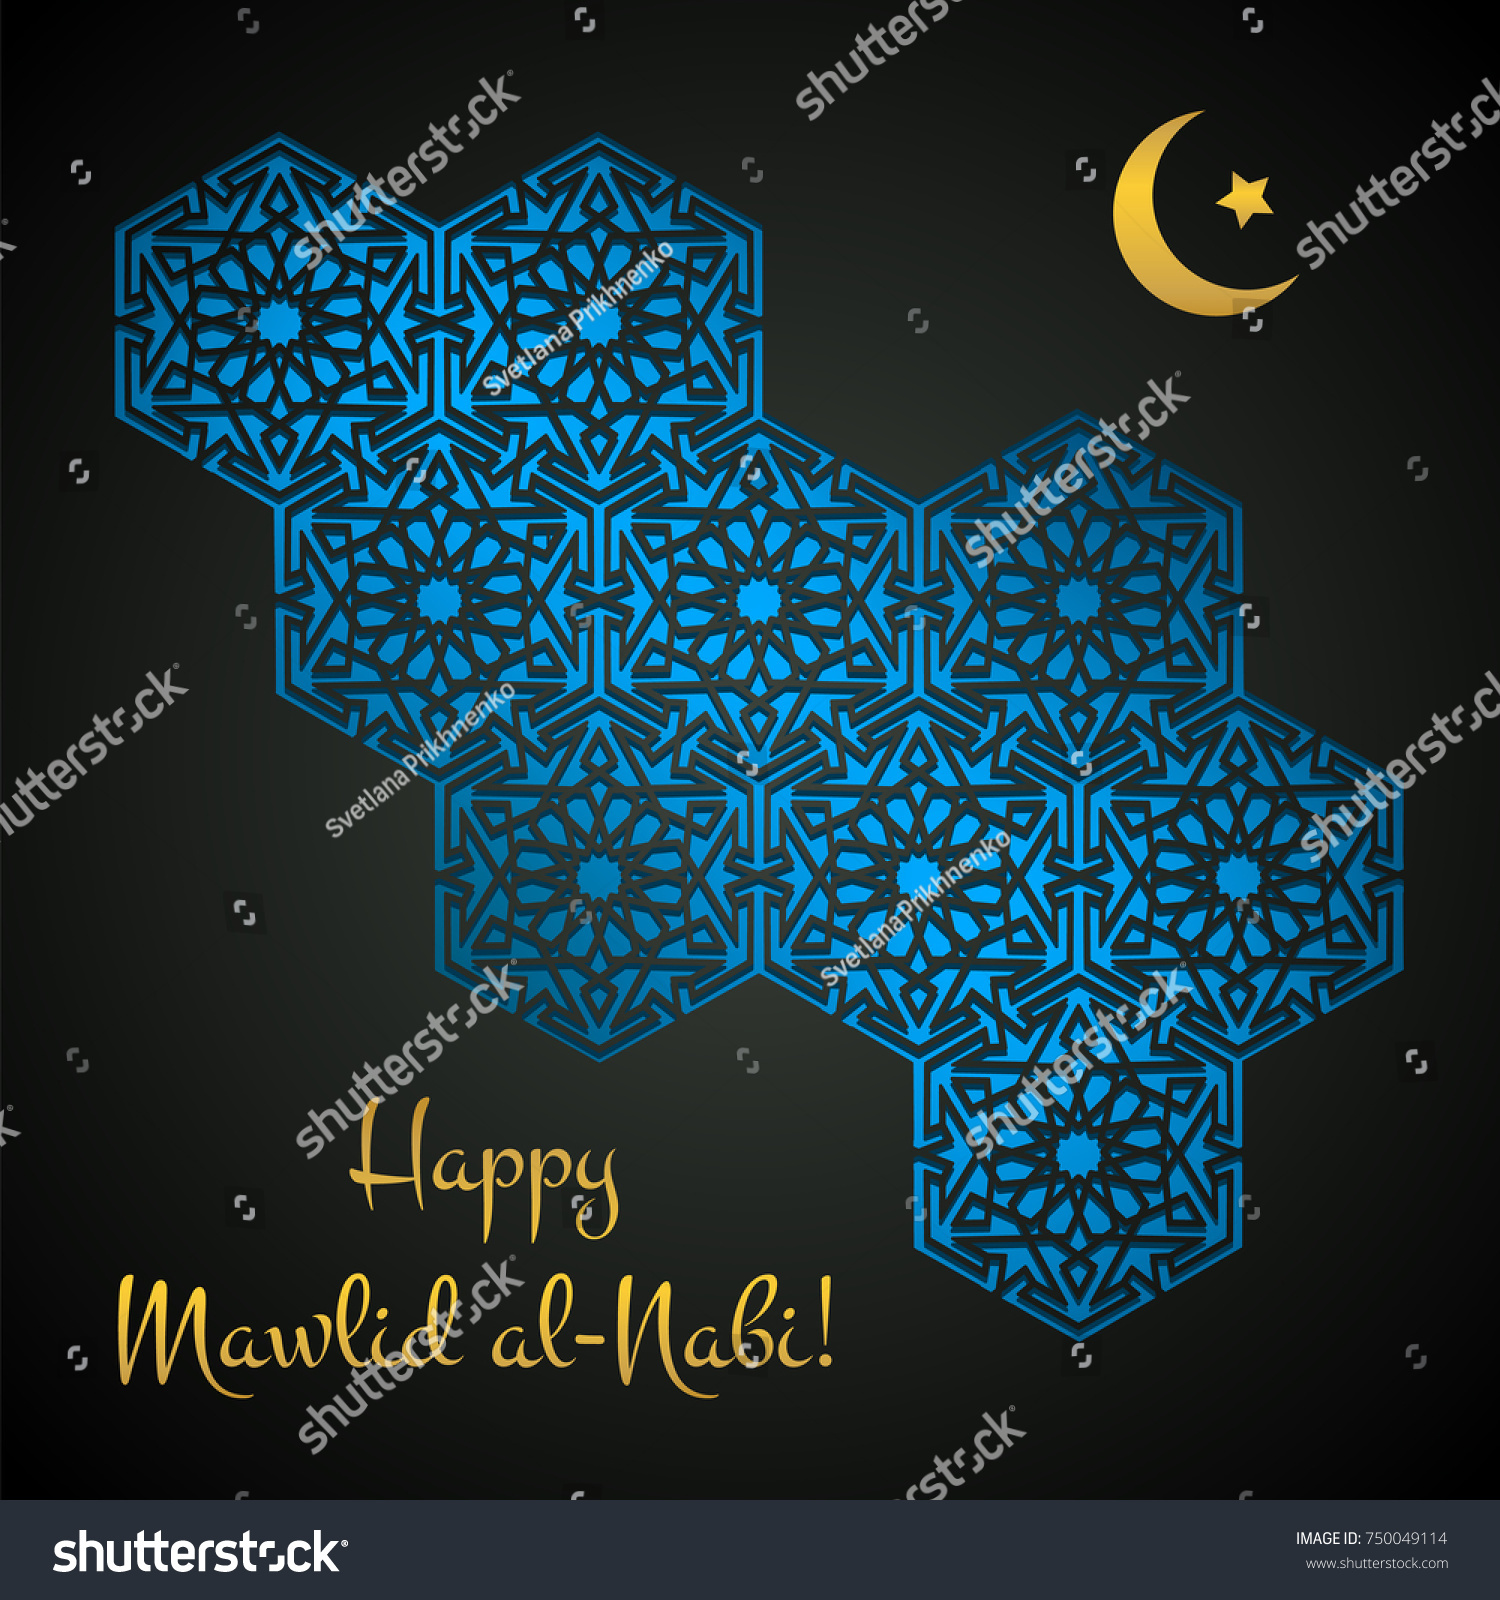 Mawlid al nabi translation prophet muhammads birthday greeting id 750049114 m4hsunfo